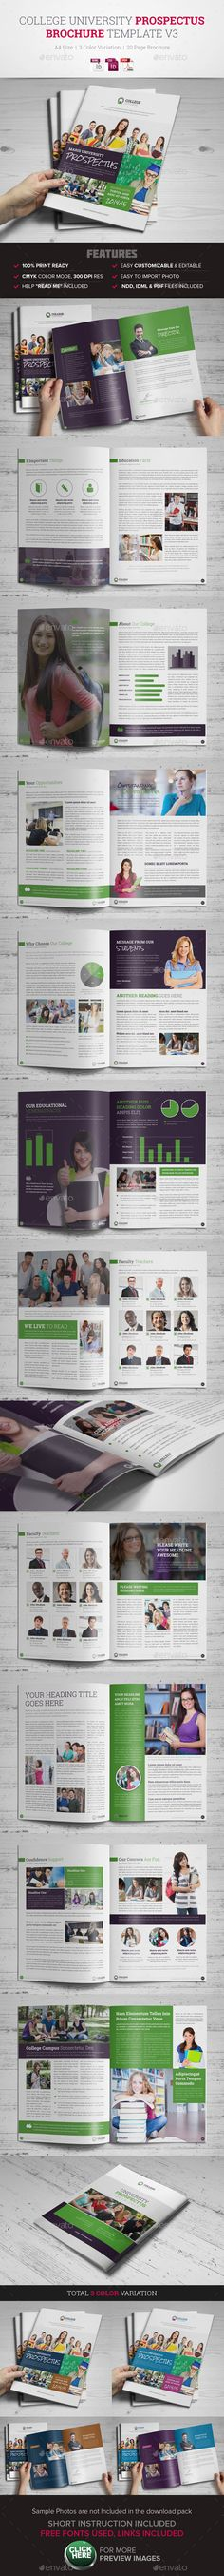 College University Prospectus/ Brochure Template #design Download: http://graphicriver.net/item/college-university-prospectus-brochure-template-3/10420246?ref=ksioks